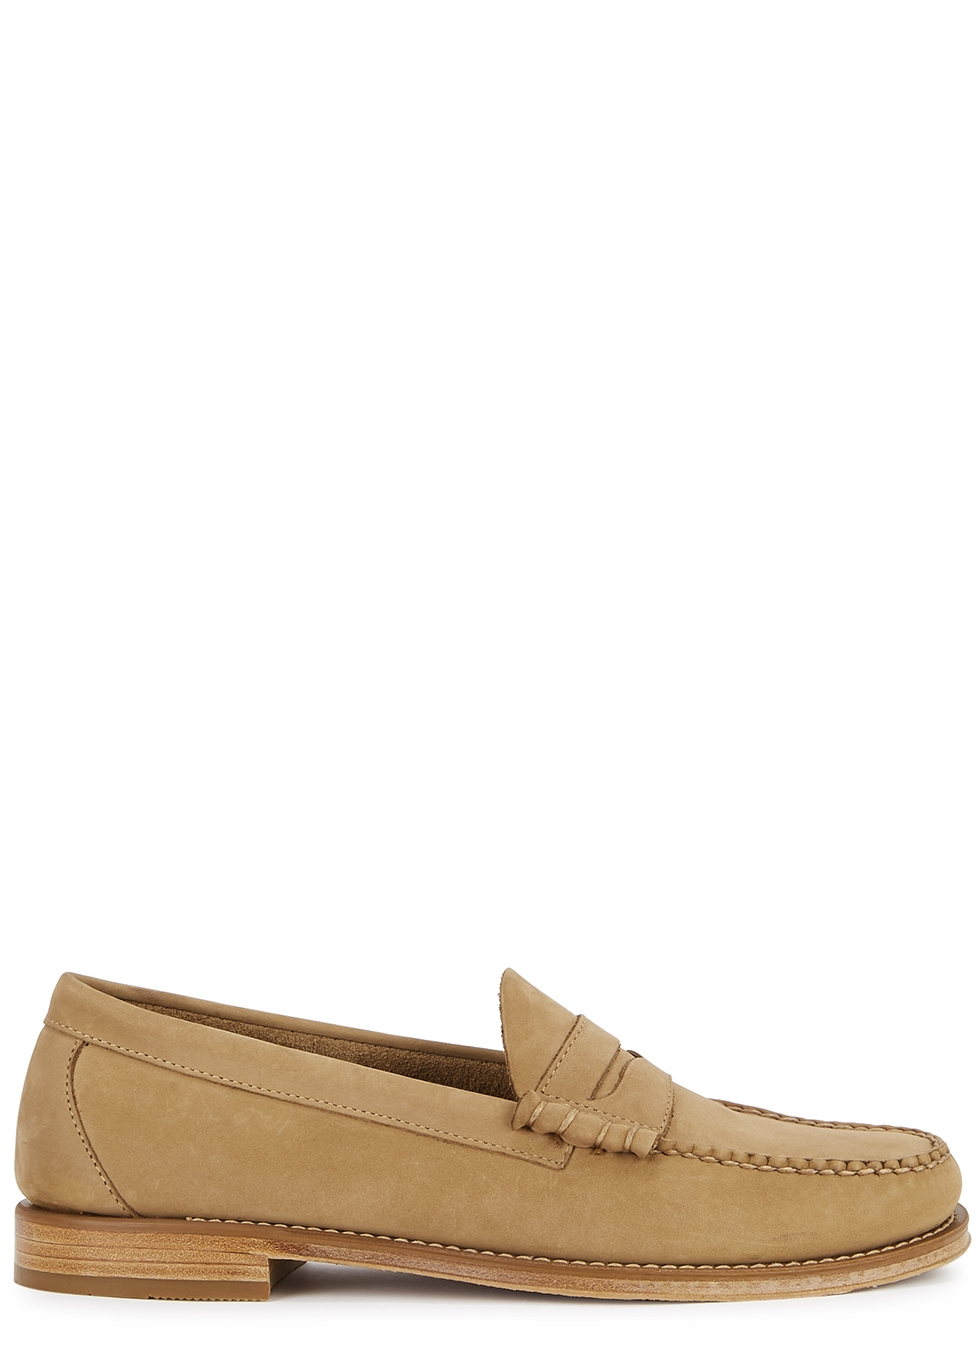 Weejuns Heritage camel nubuck loafers